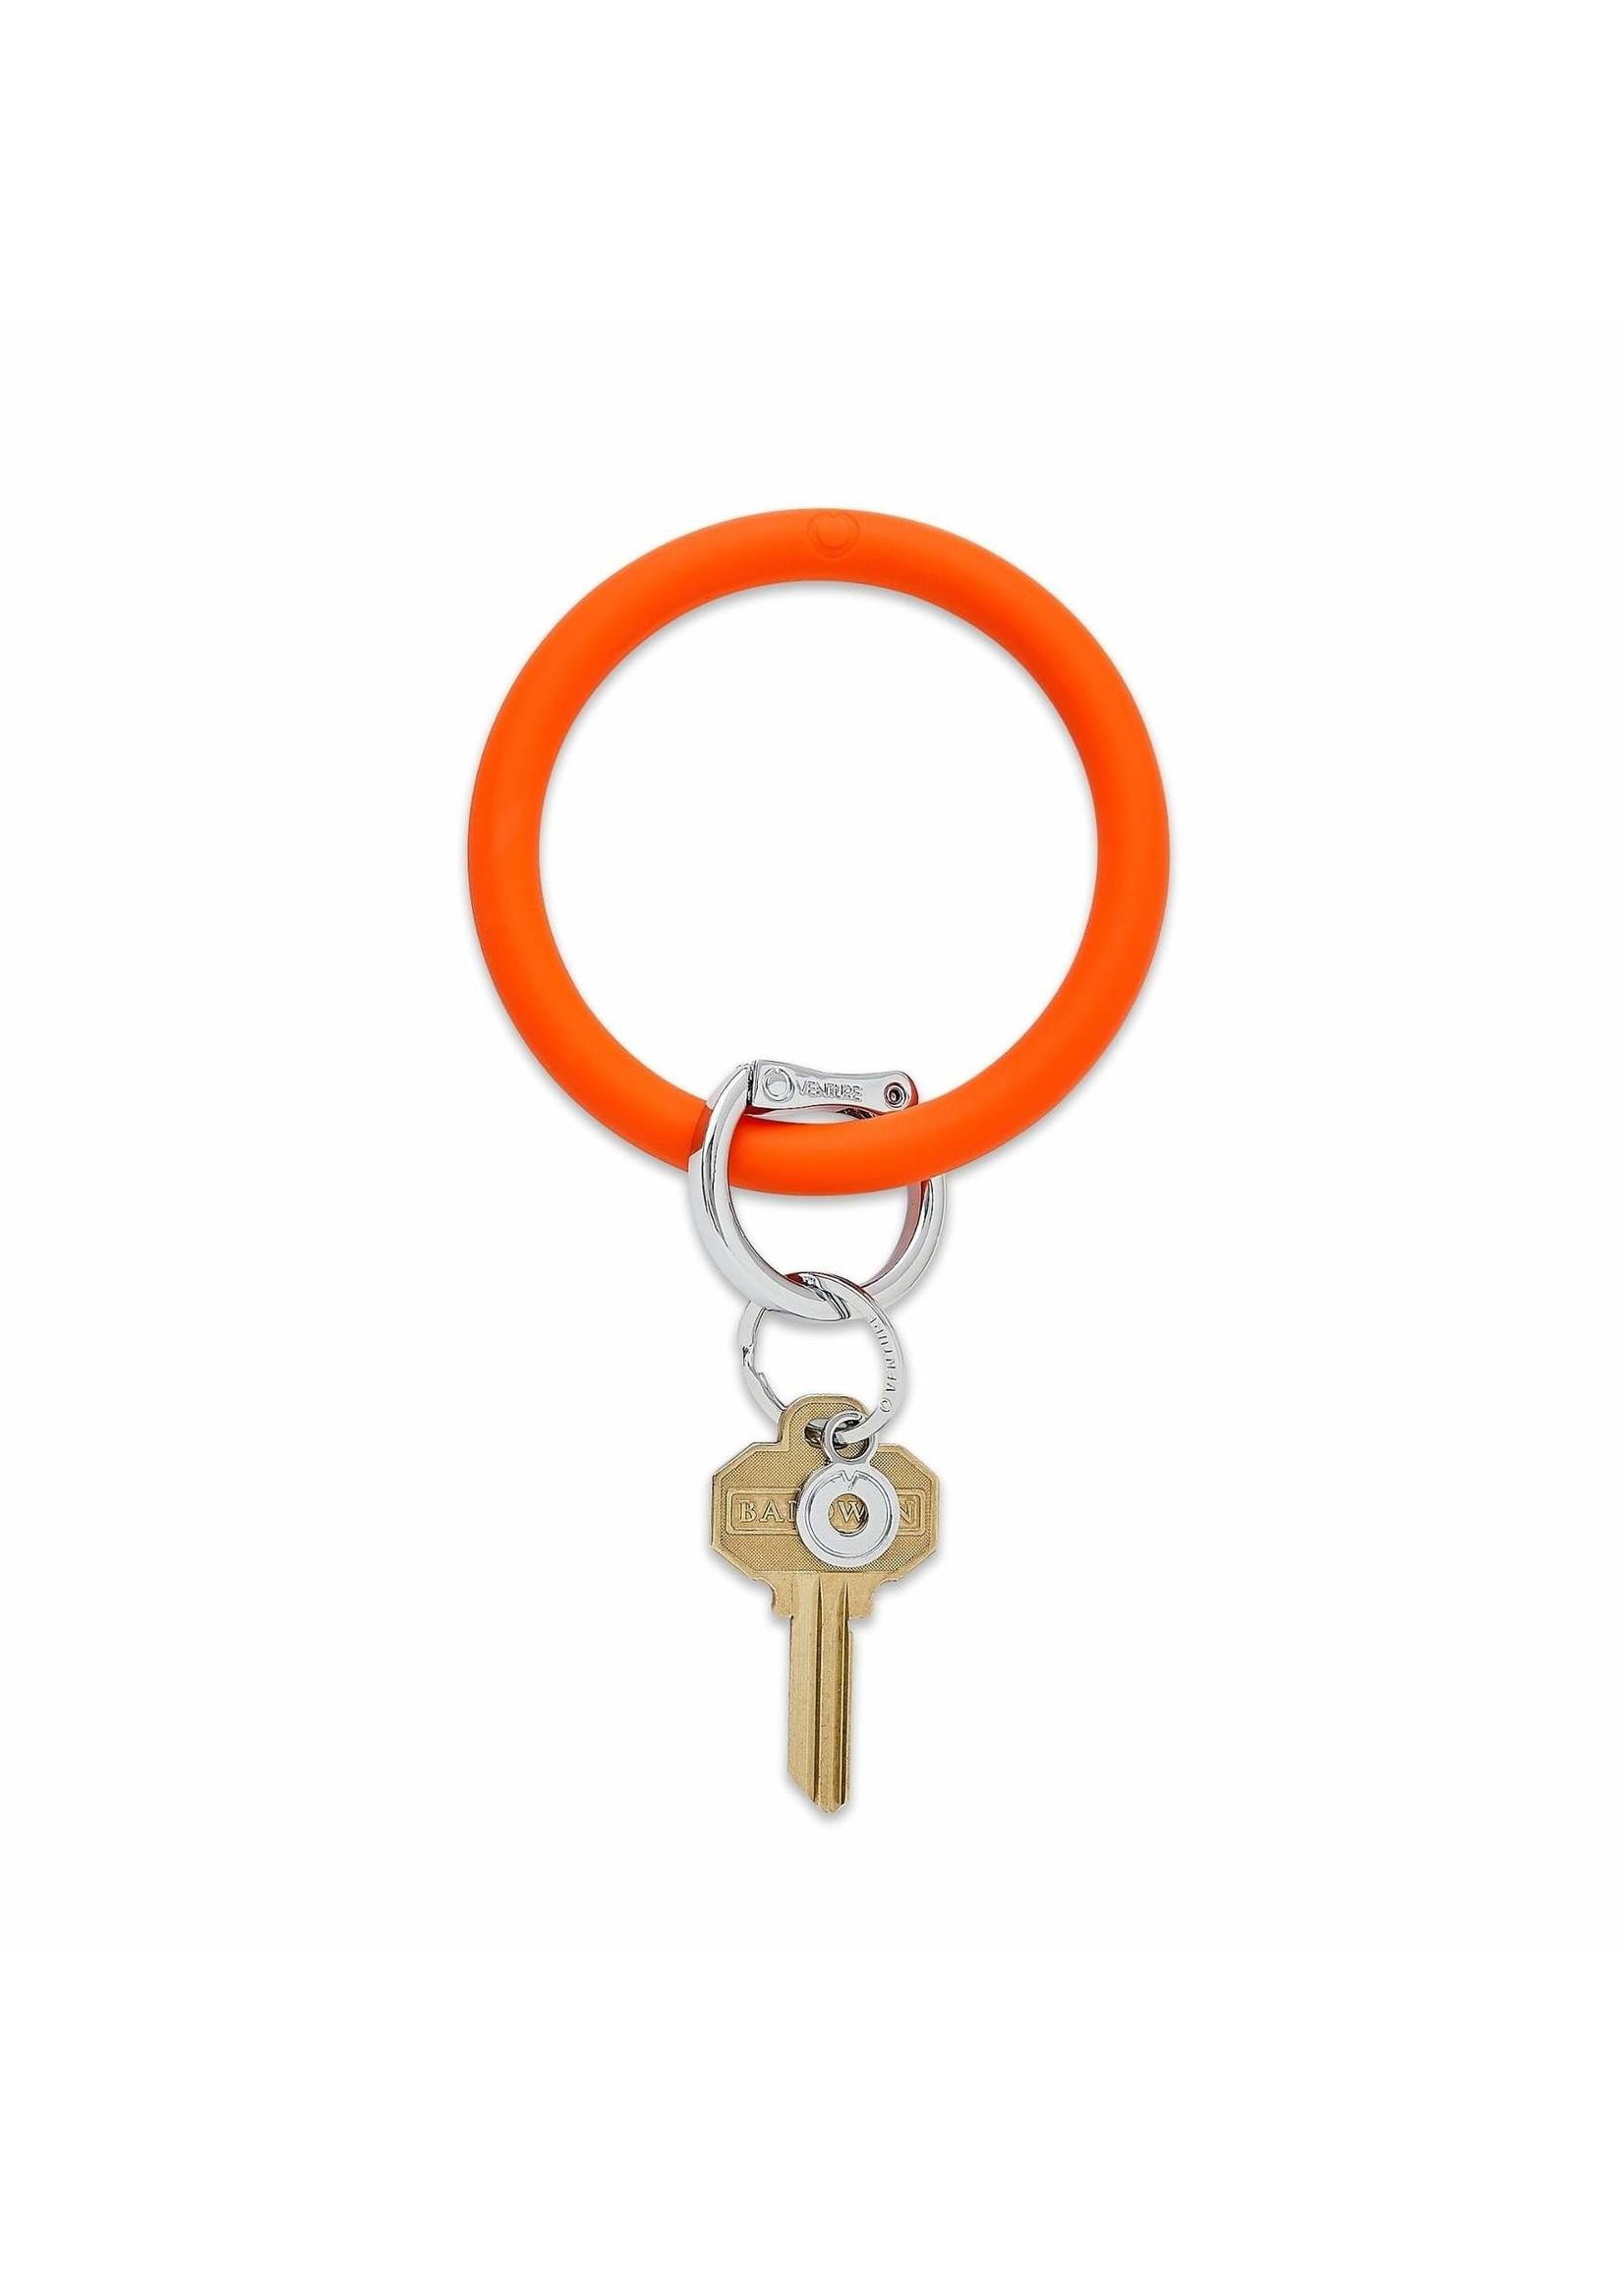 O-venture Silicone Key Ring - Orange Crush